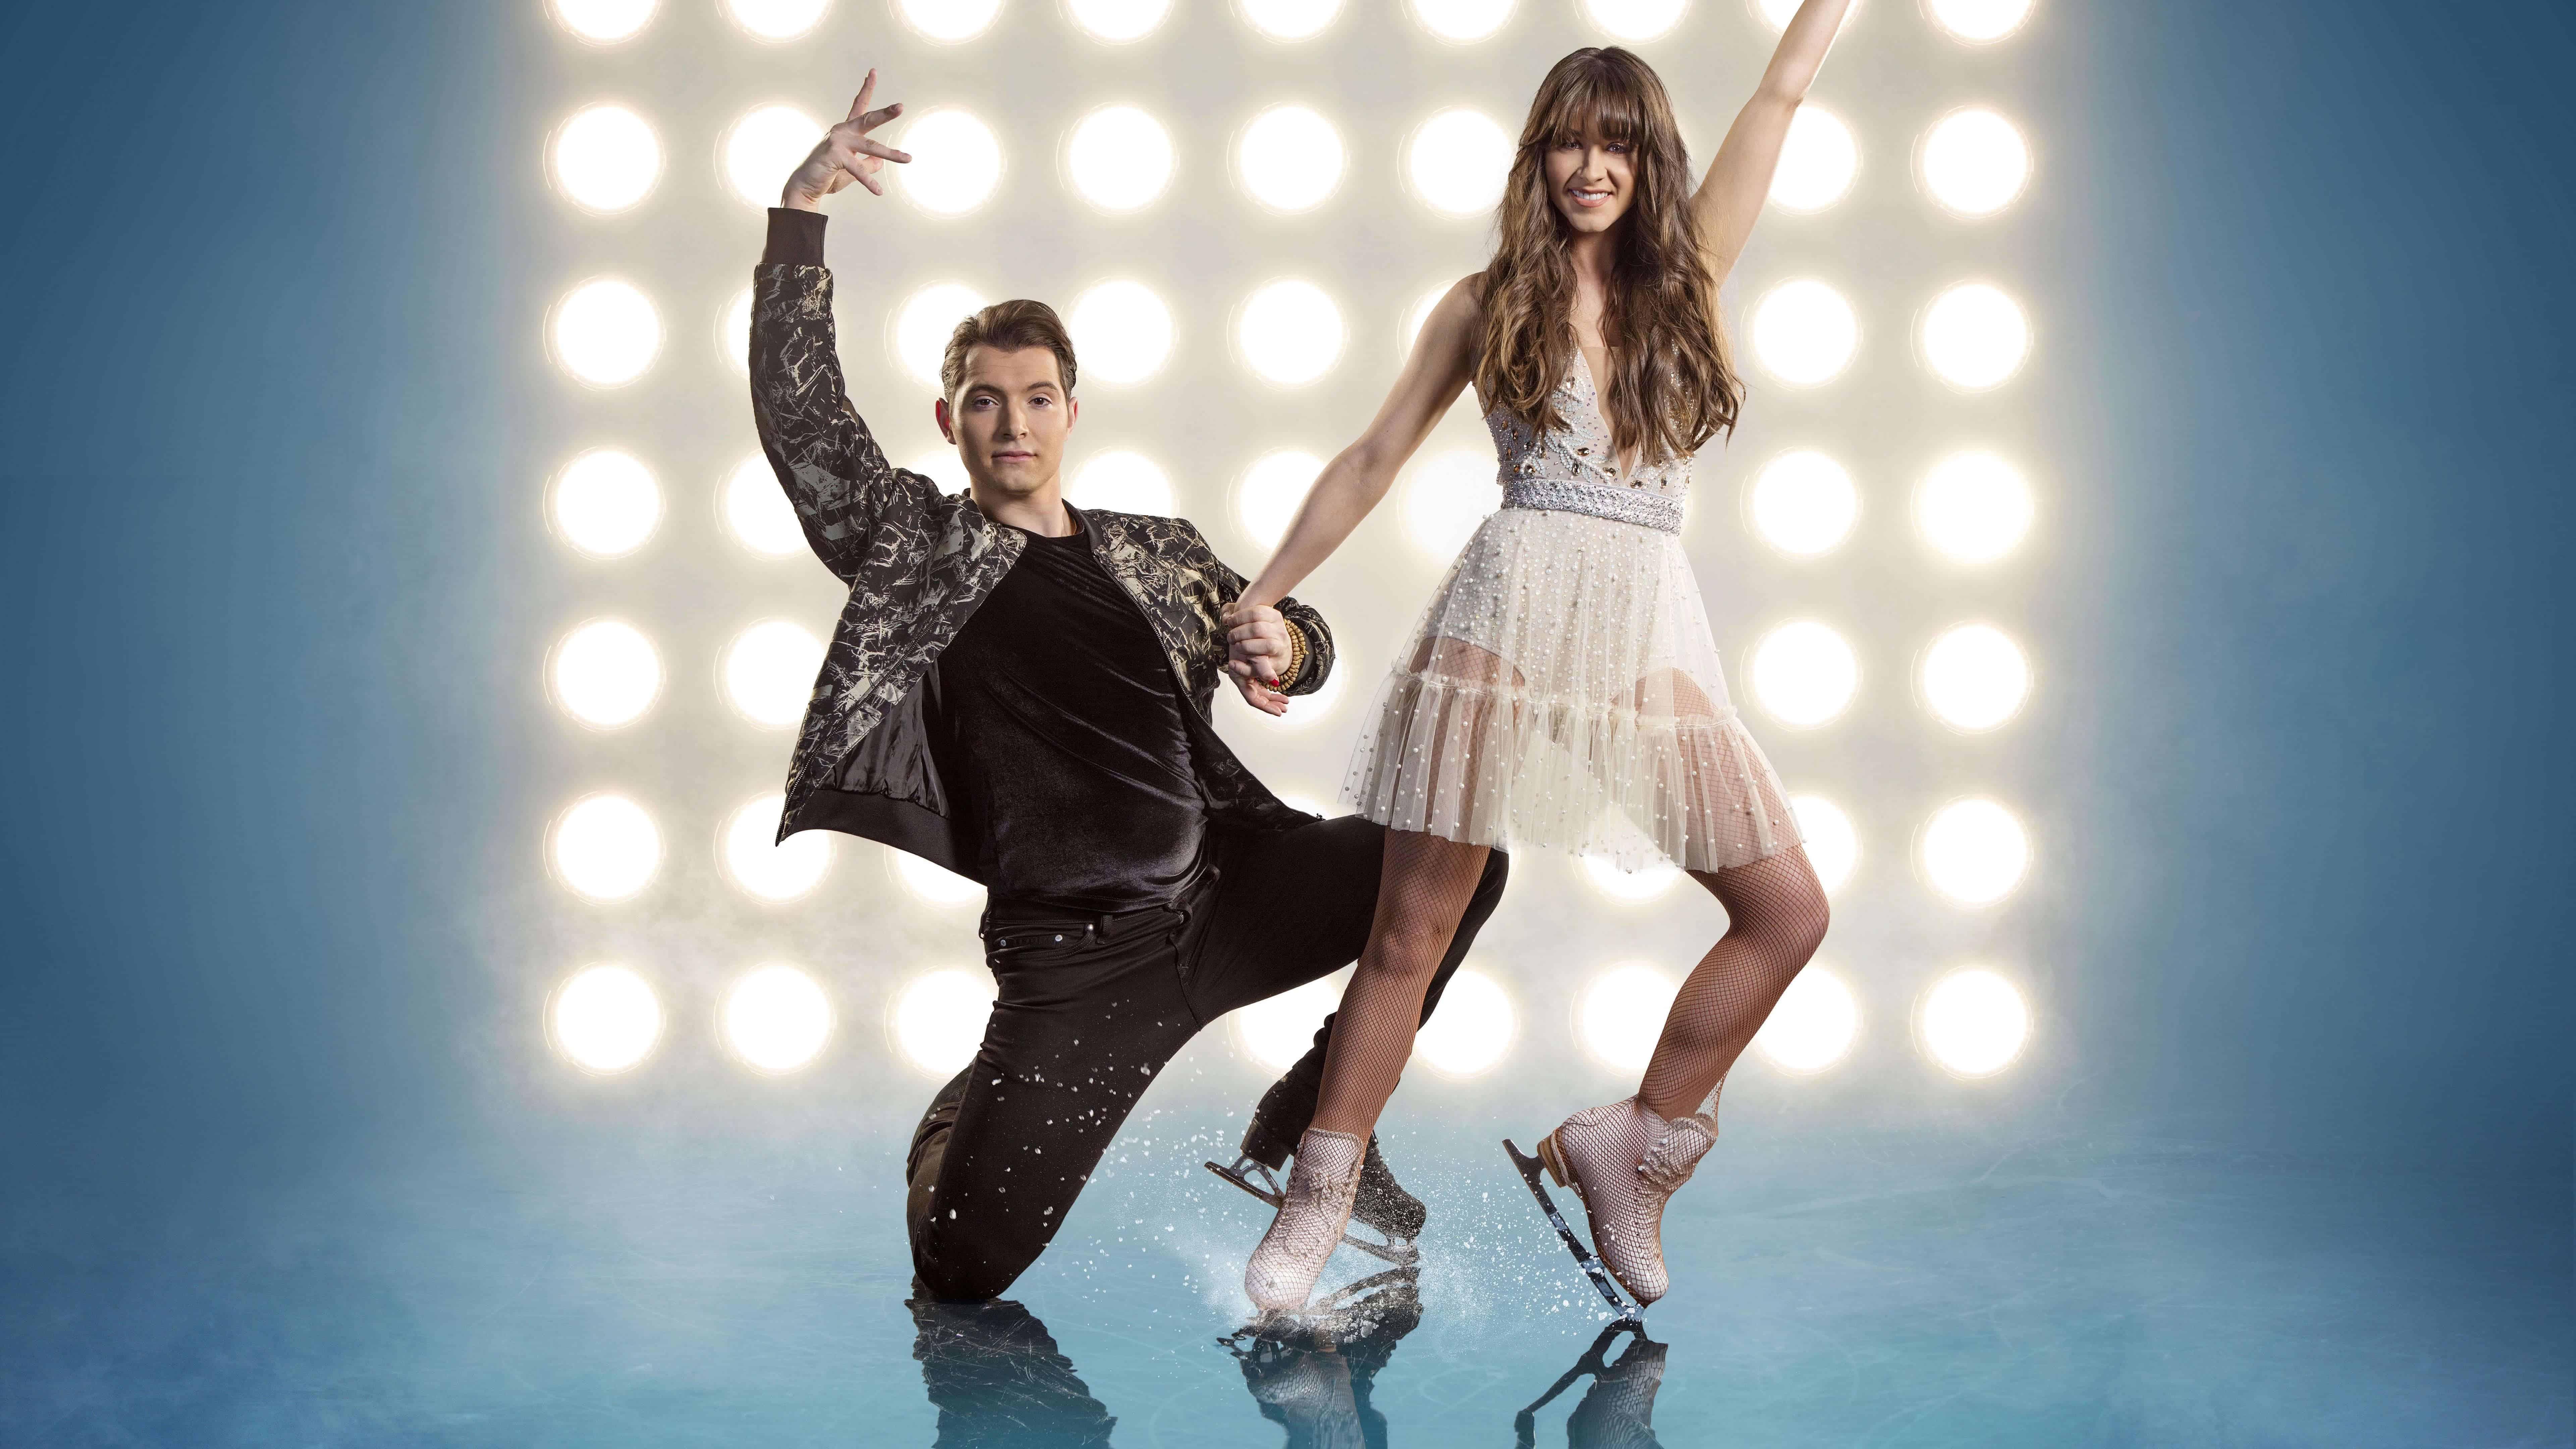 dancing on ice brooke vincent matej silecky uhd 8k wallpaper